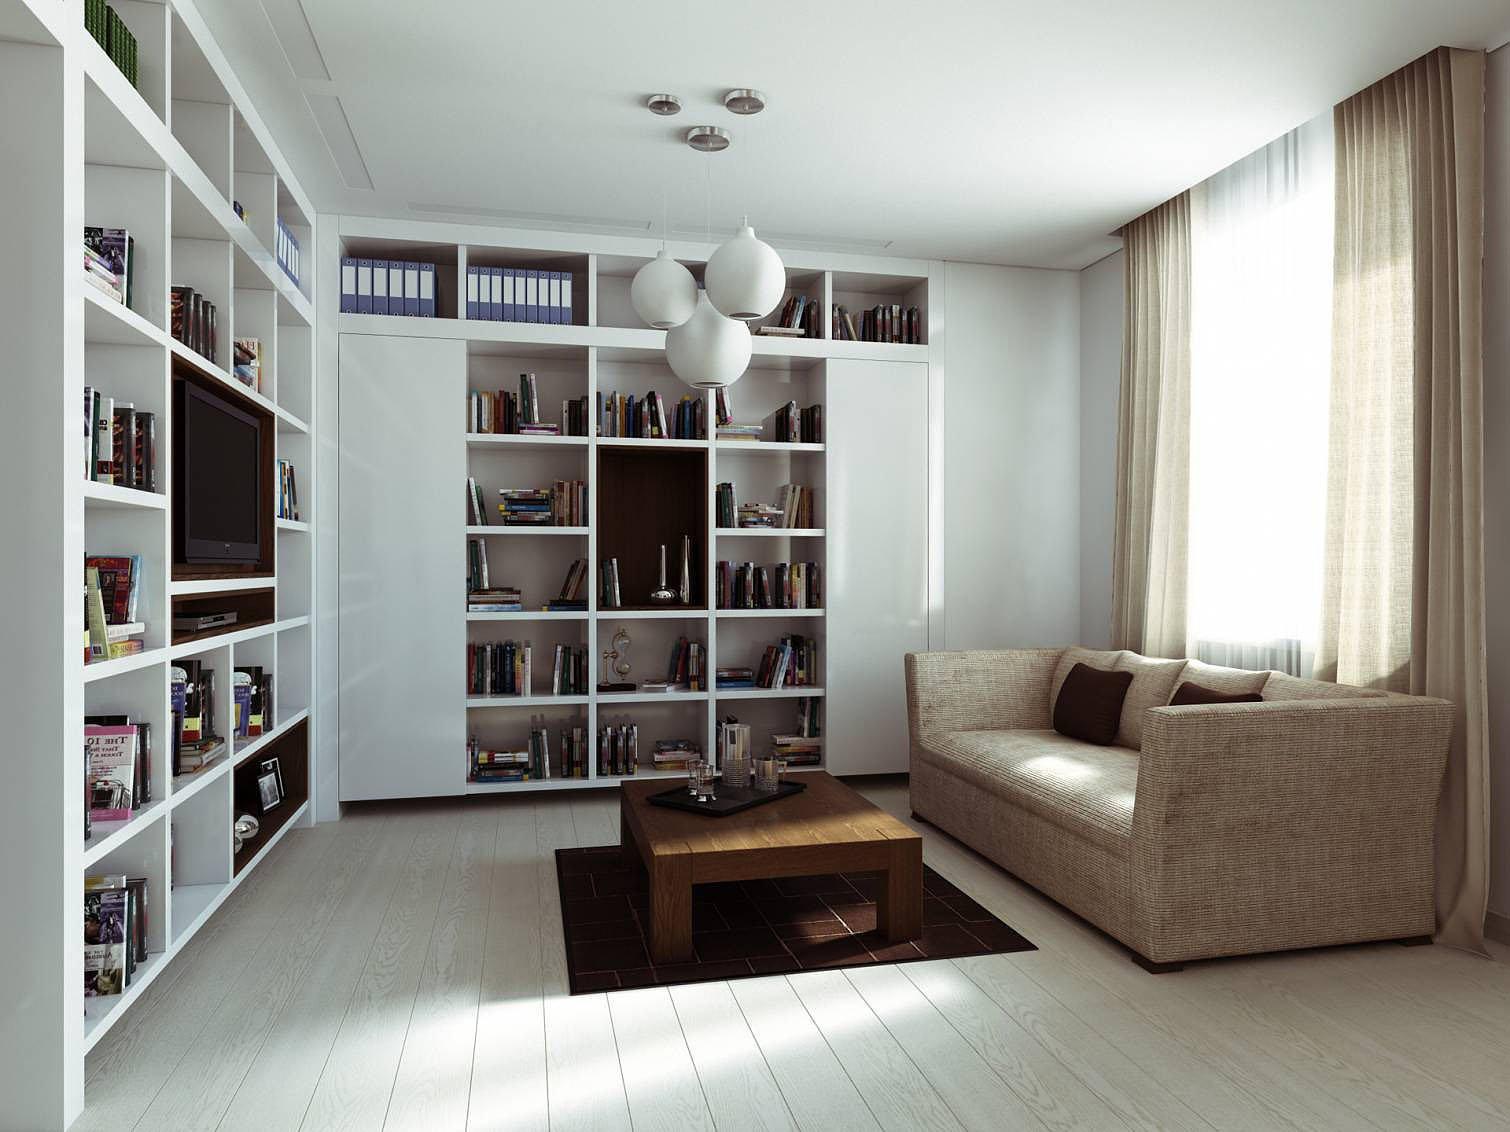 Apartment-Design-in-Moskovyan-Plaza-16